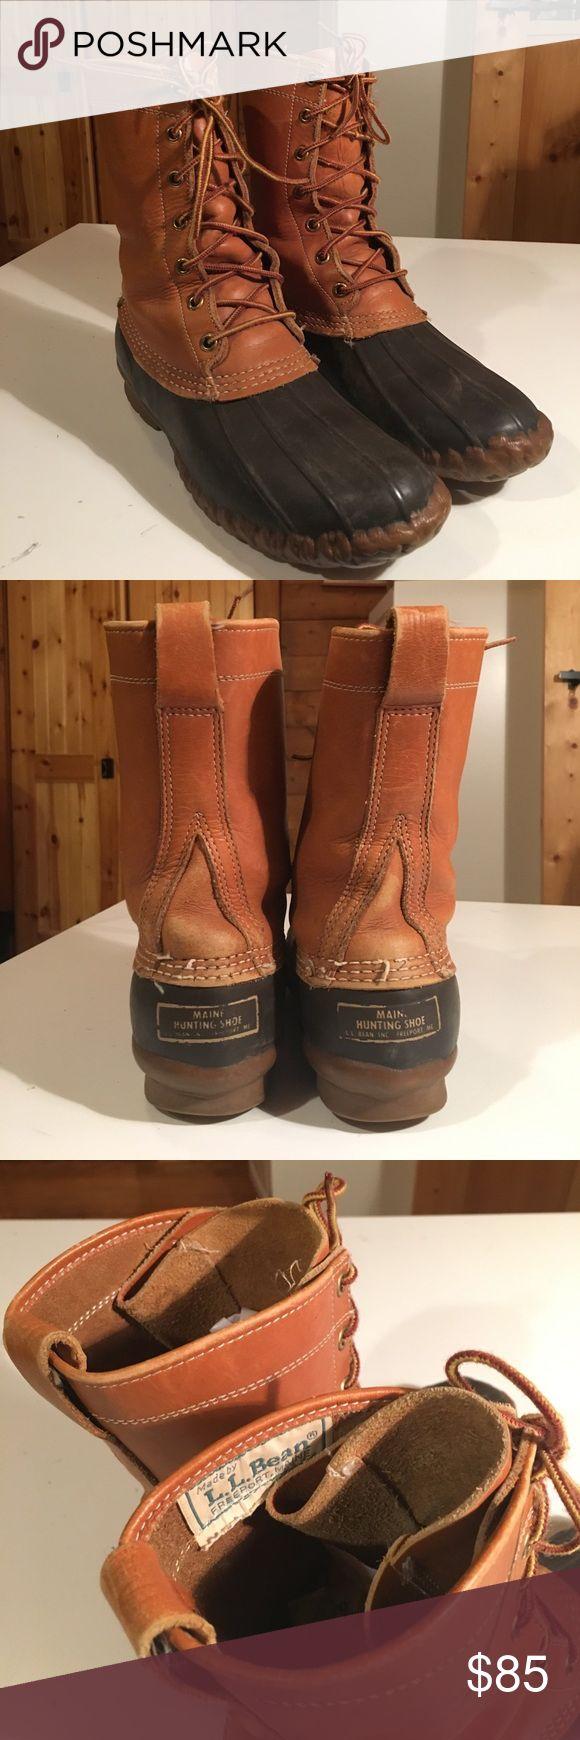 "Vintage LL Bean Duck Boot Vintage ""Maine Hunting Shoe"" LL Bean Duck Boots. Size 9. LL Bean Shoes Winter & Rain Boots"